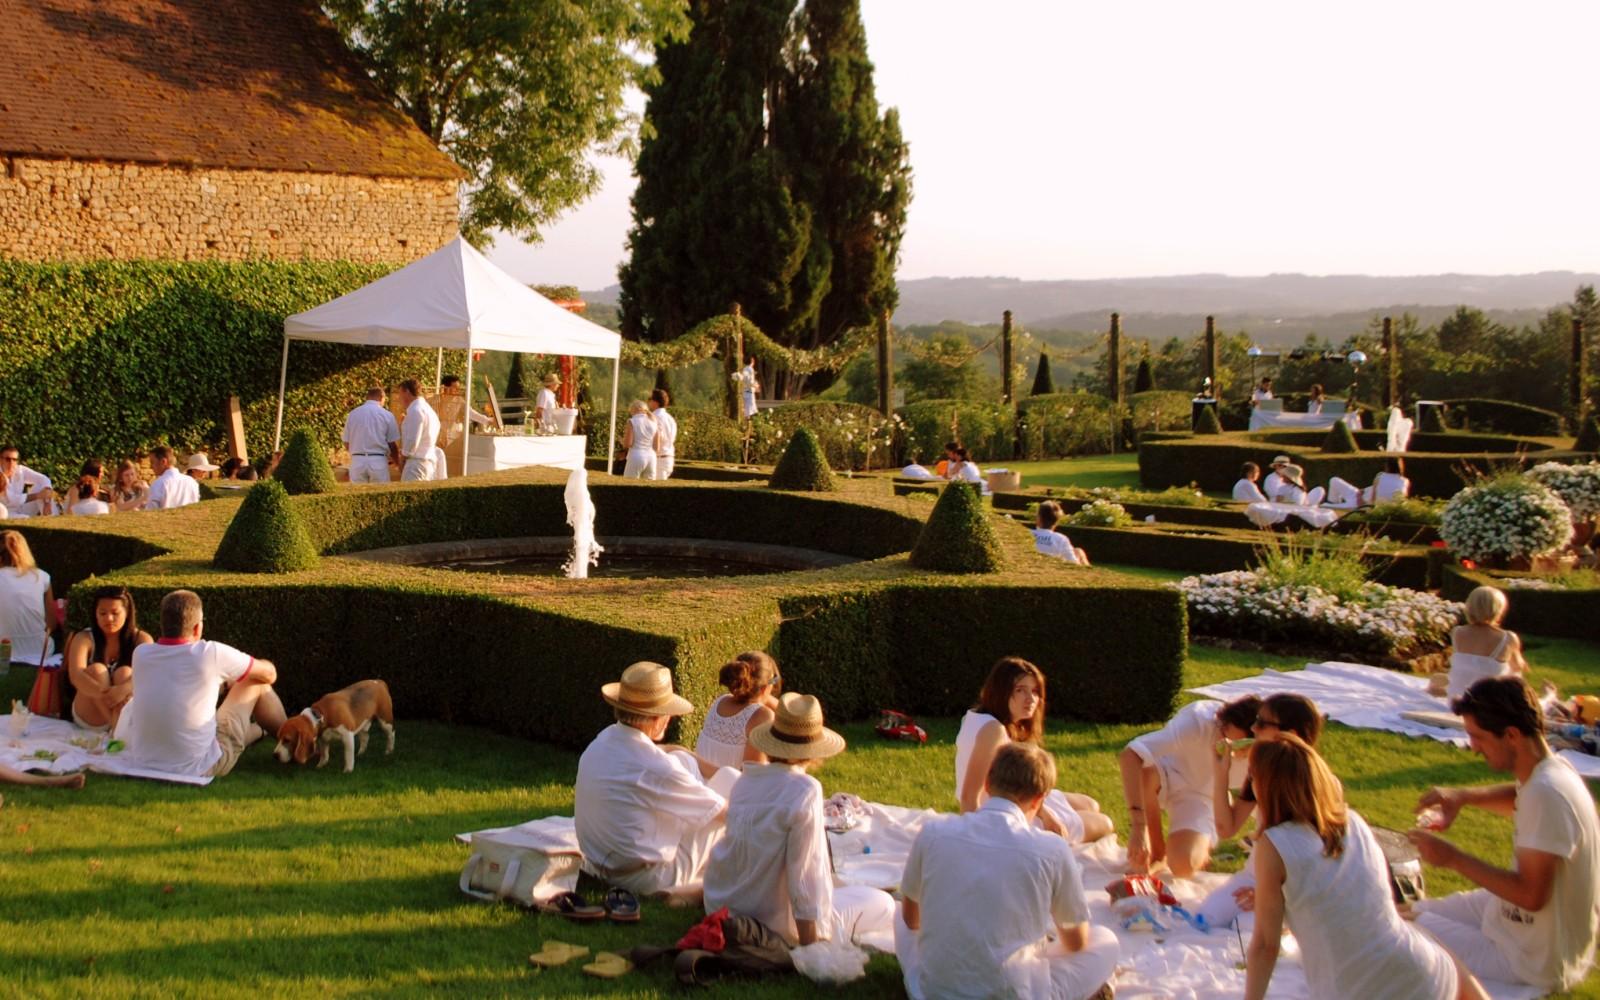 Les Jardins Du Manoir D Eyrignac Francecomfort Parcs De